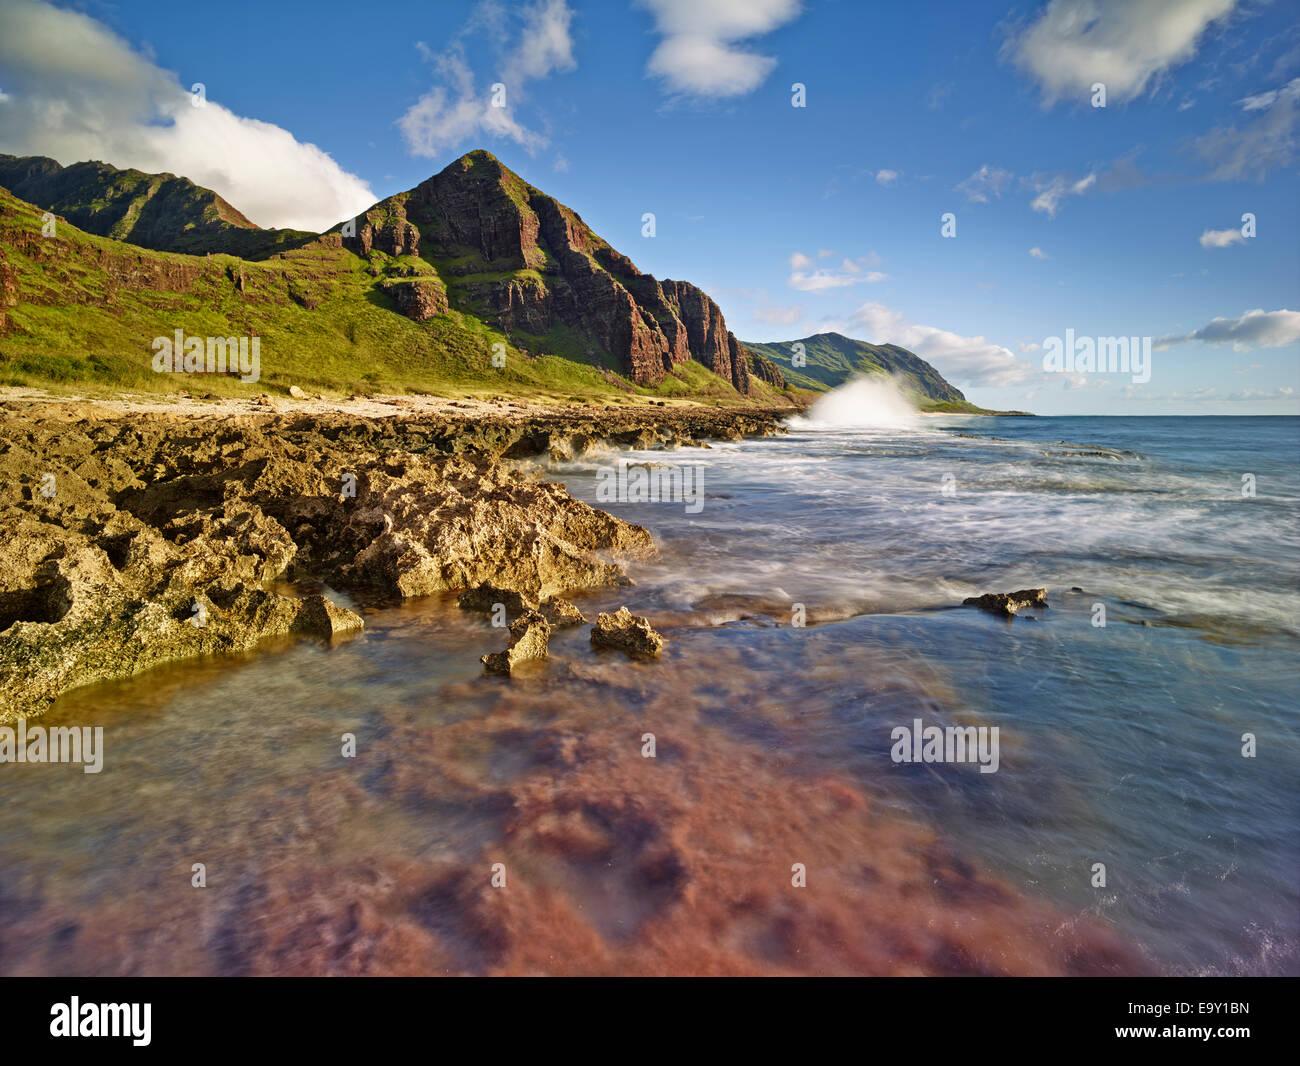 Costa de Ka'ena Point State Park, Oahu, Hawai, Estados Unidos Imagen De Stock